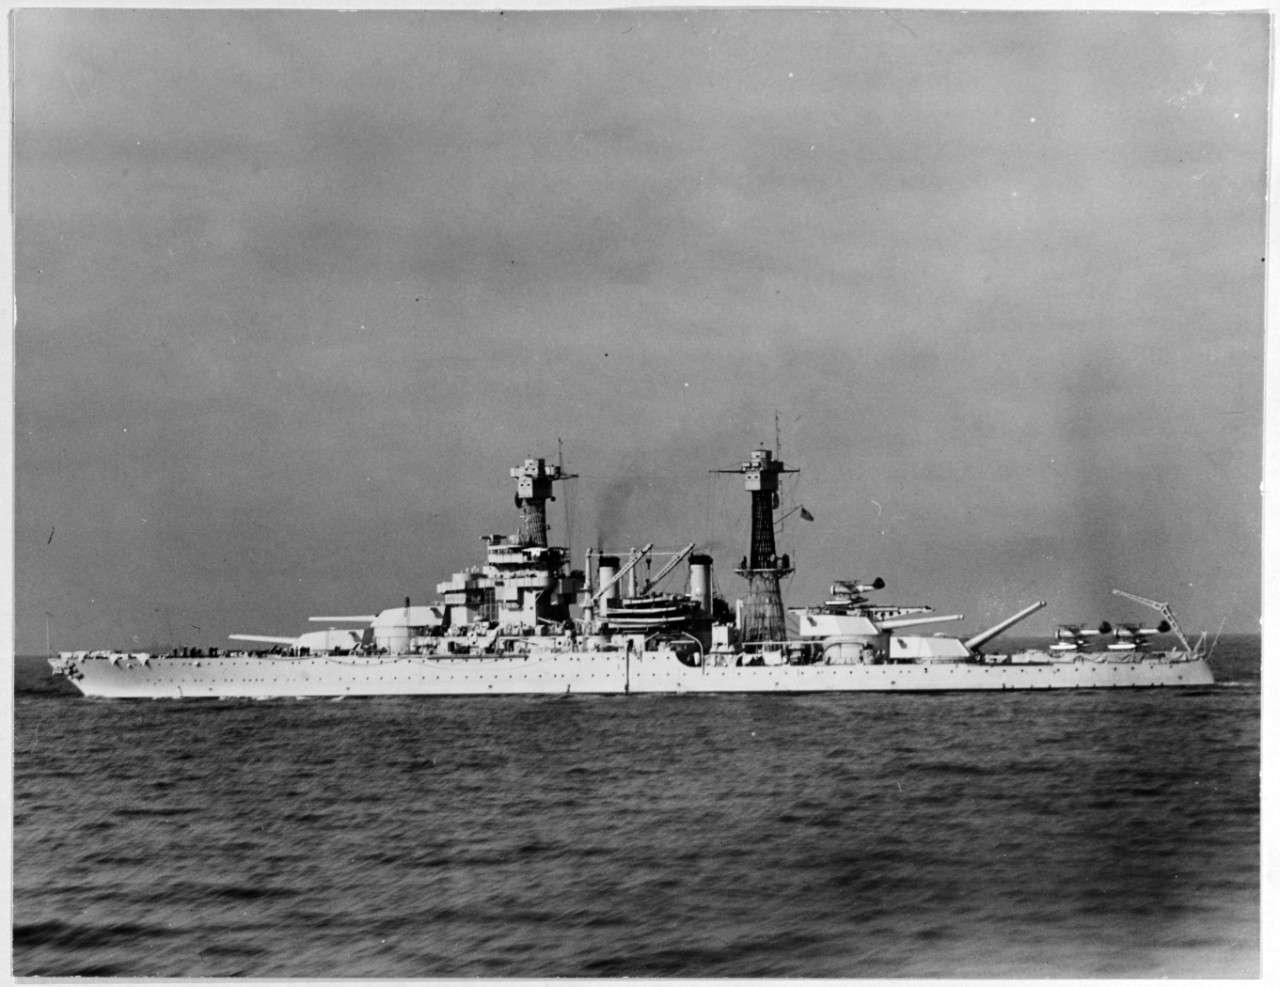 Battleship USS Colorado (BB-45) at anchor.